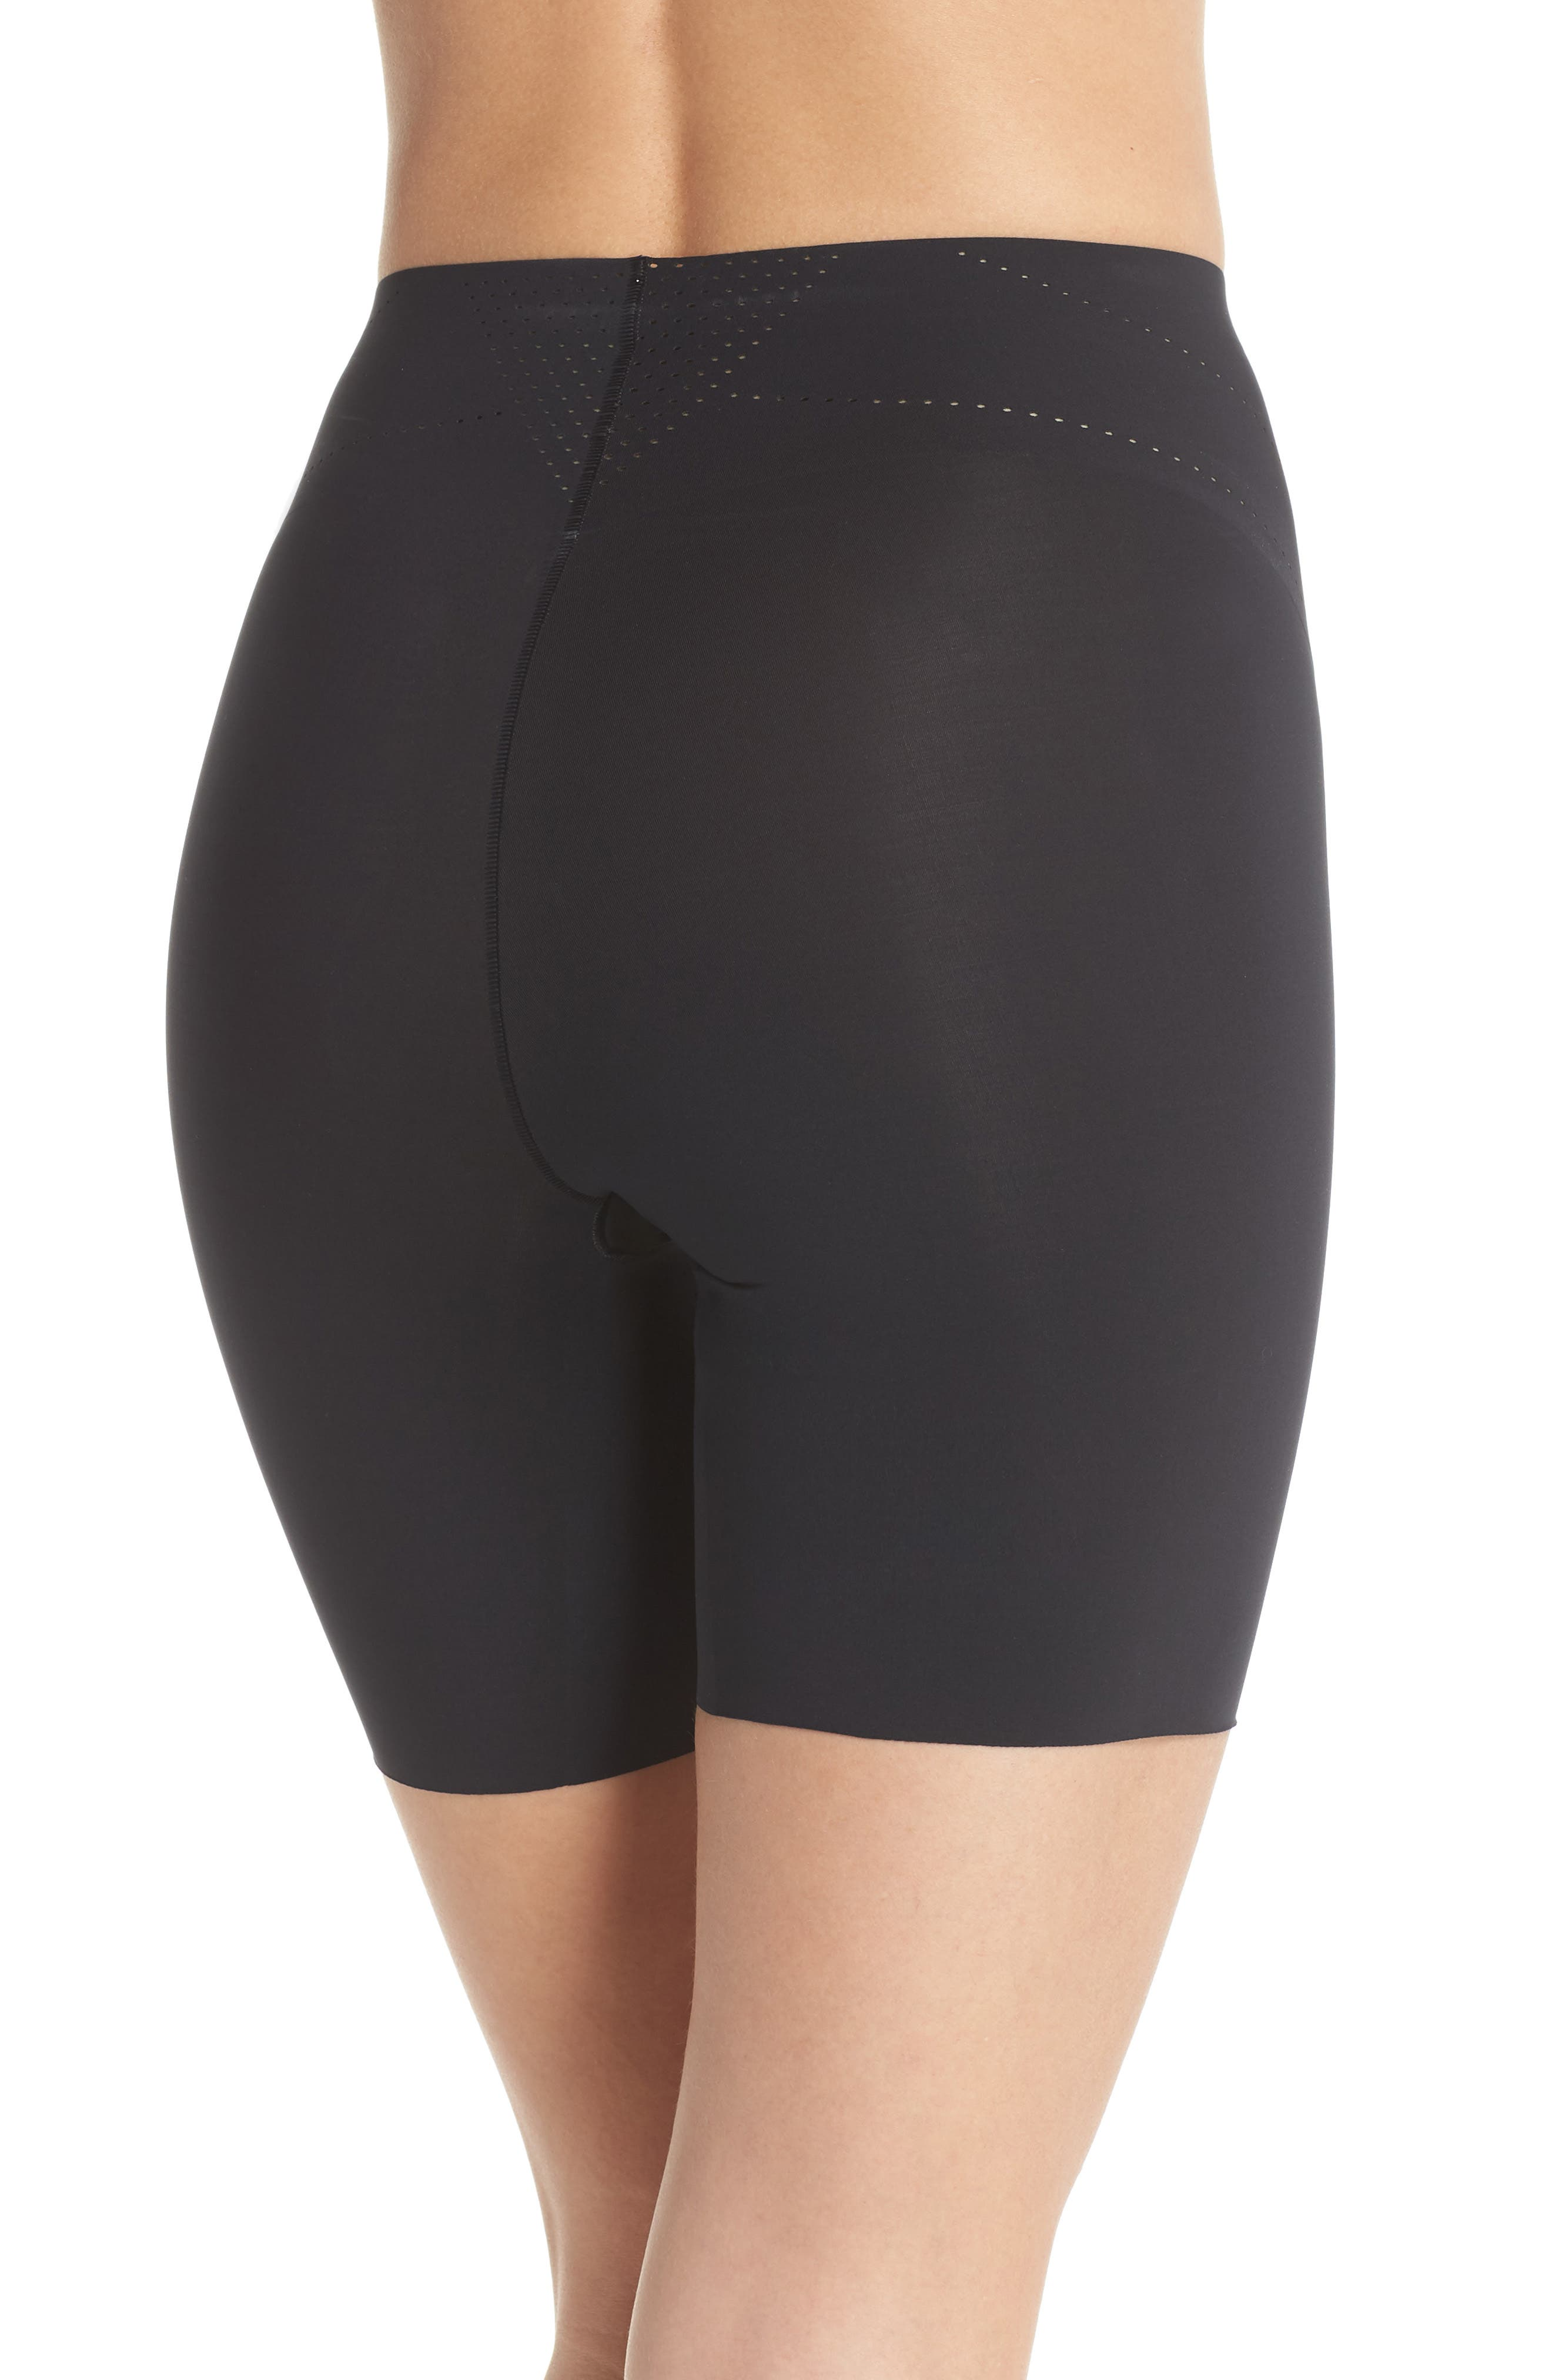 Shape Air Shaper Shorts,                             Alternate thumbnail 2, color,                             Black